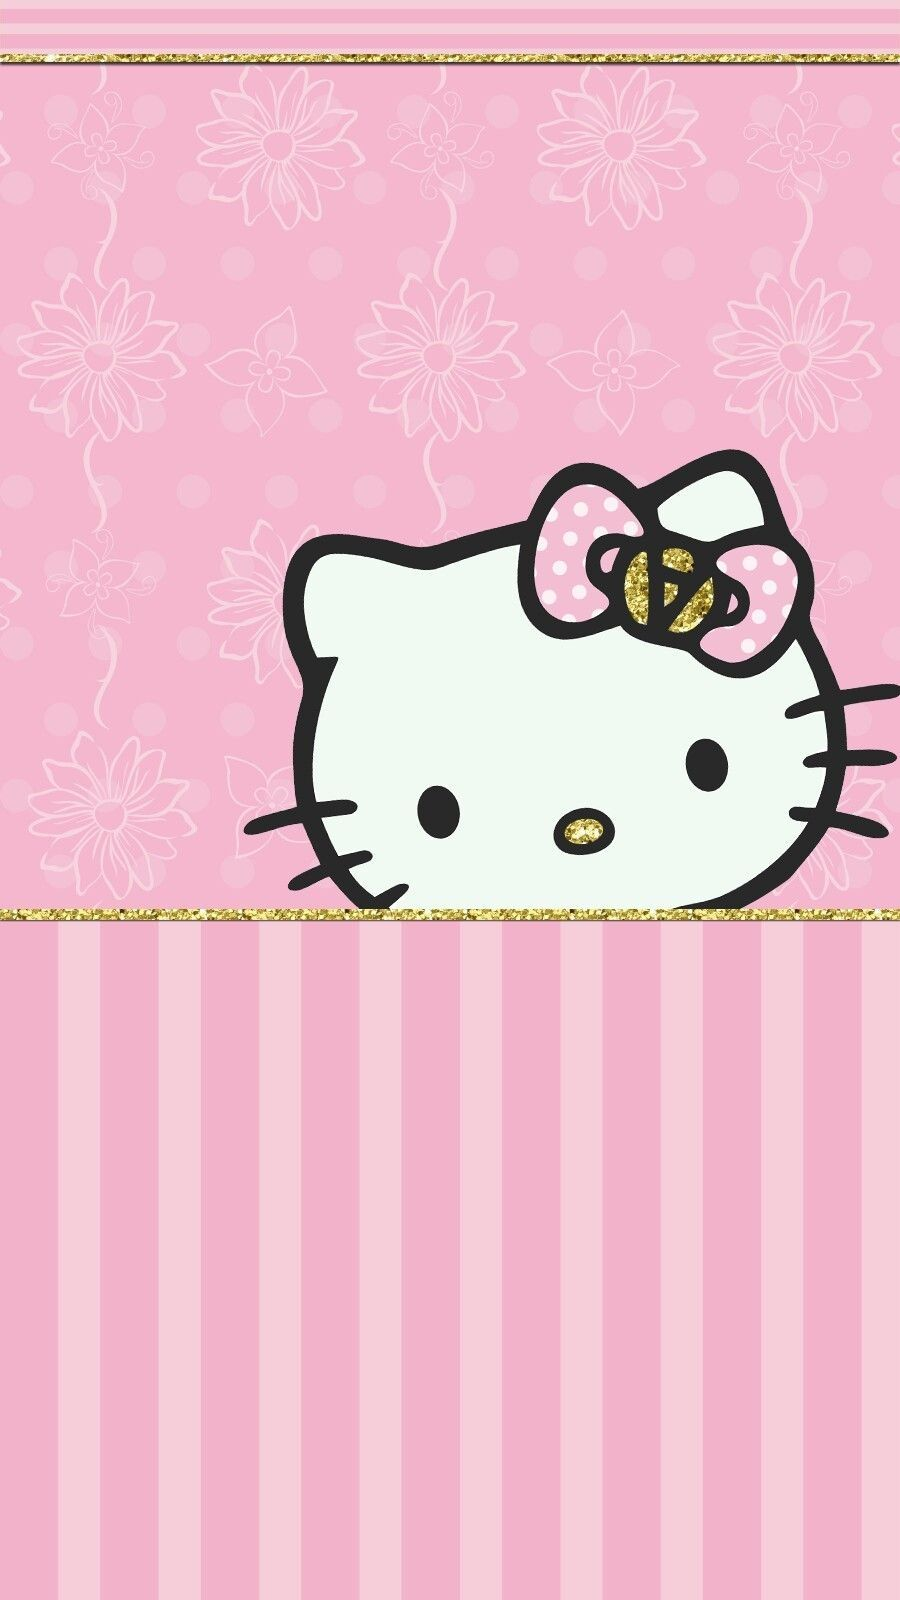 Hello Kitty Princess Pink Wallpaper Android Iphone Regarding Hello